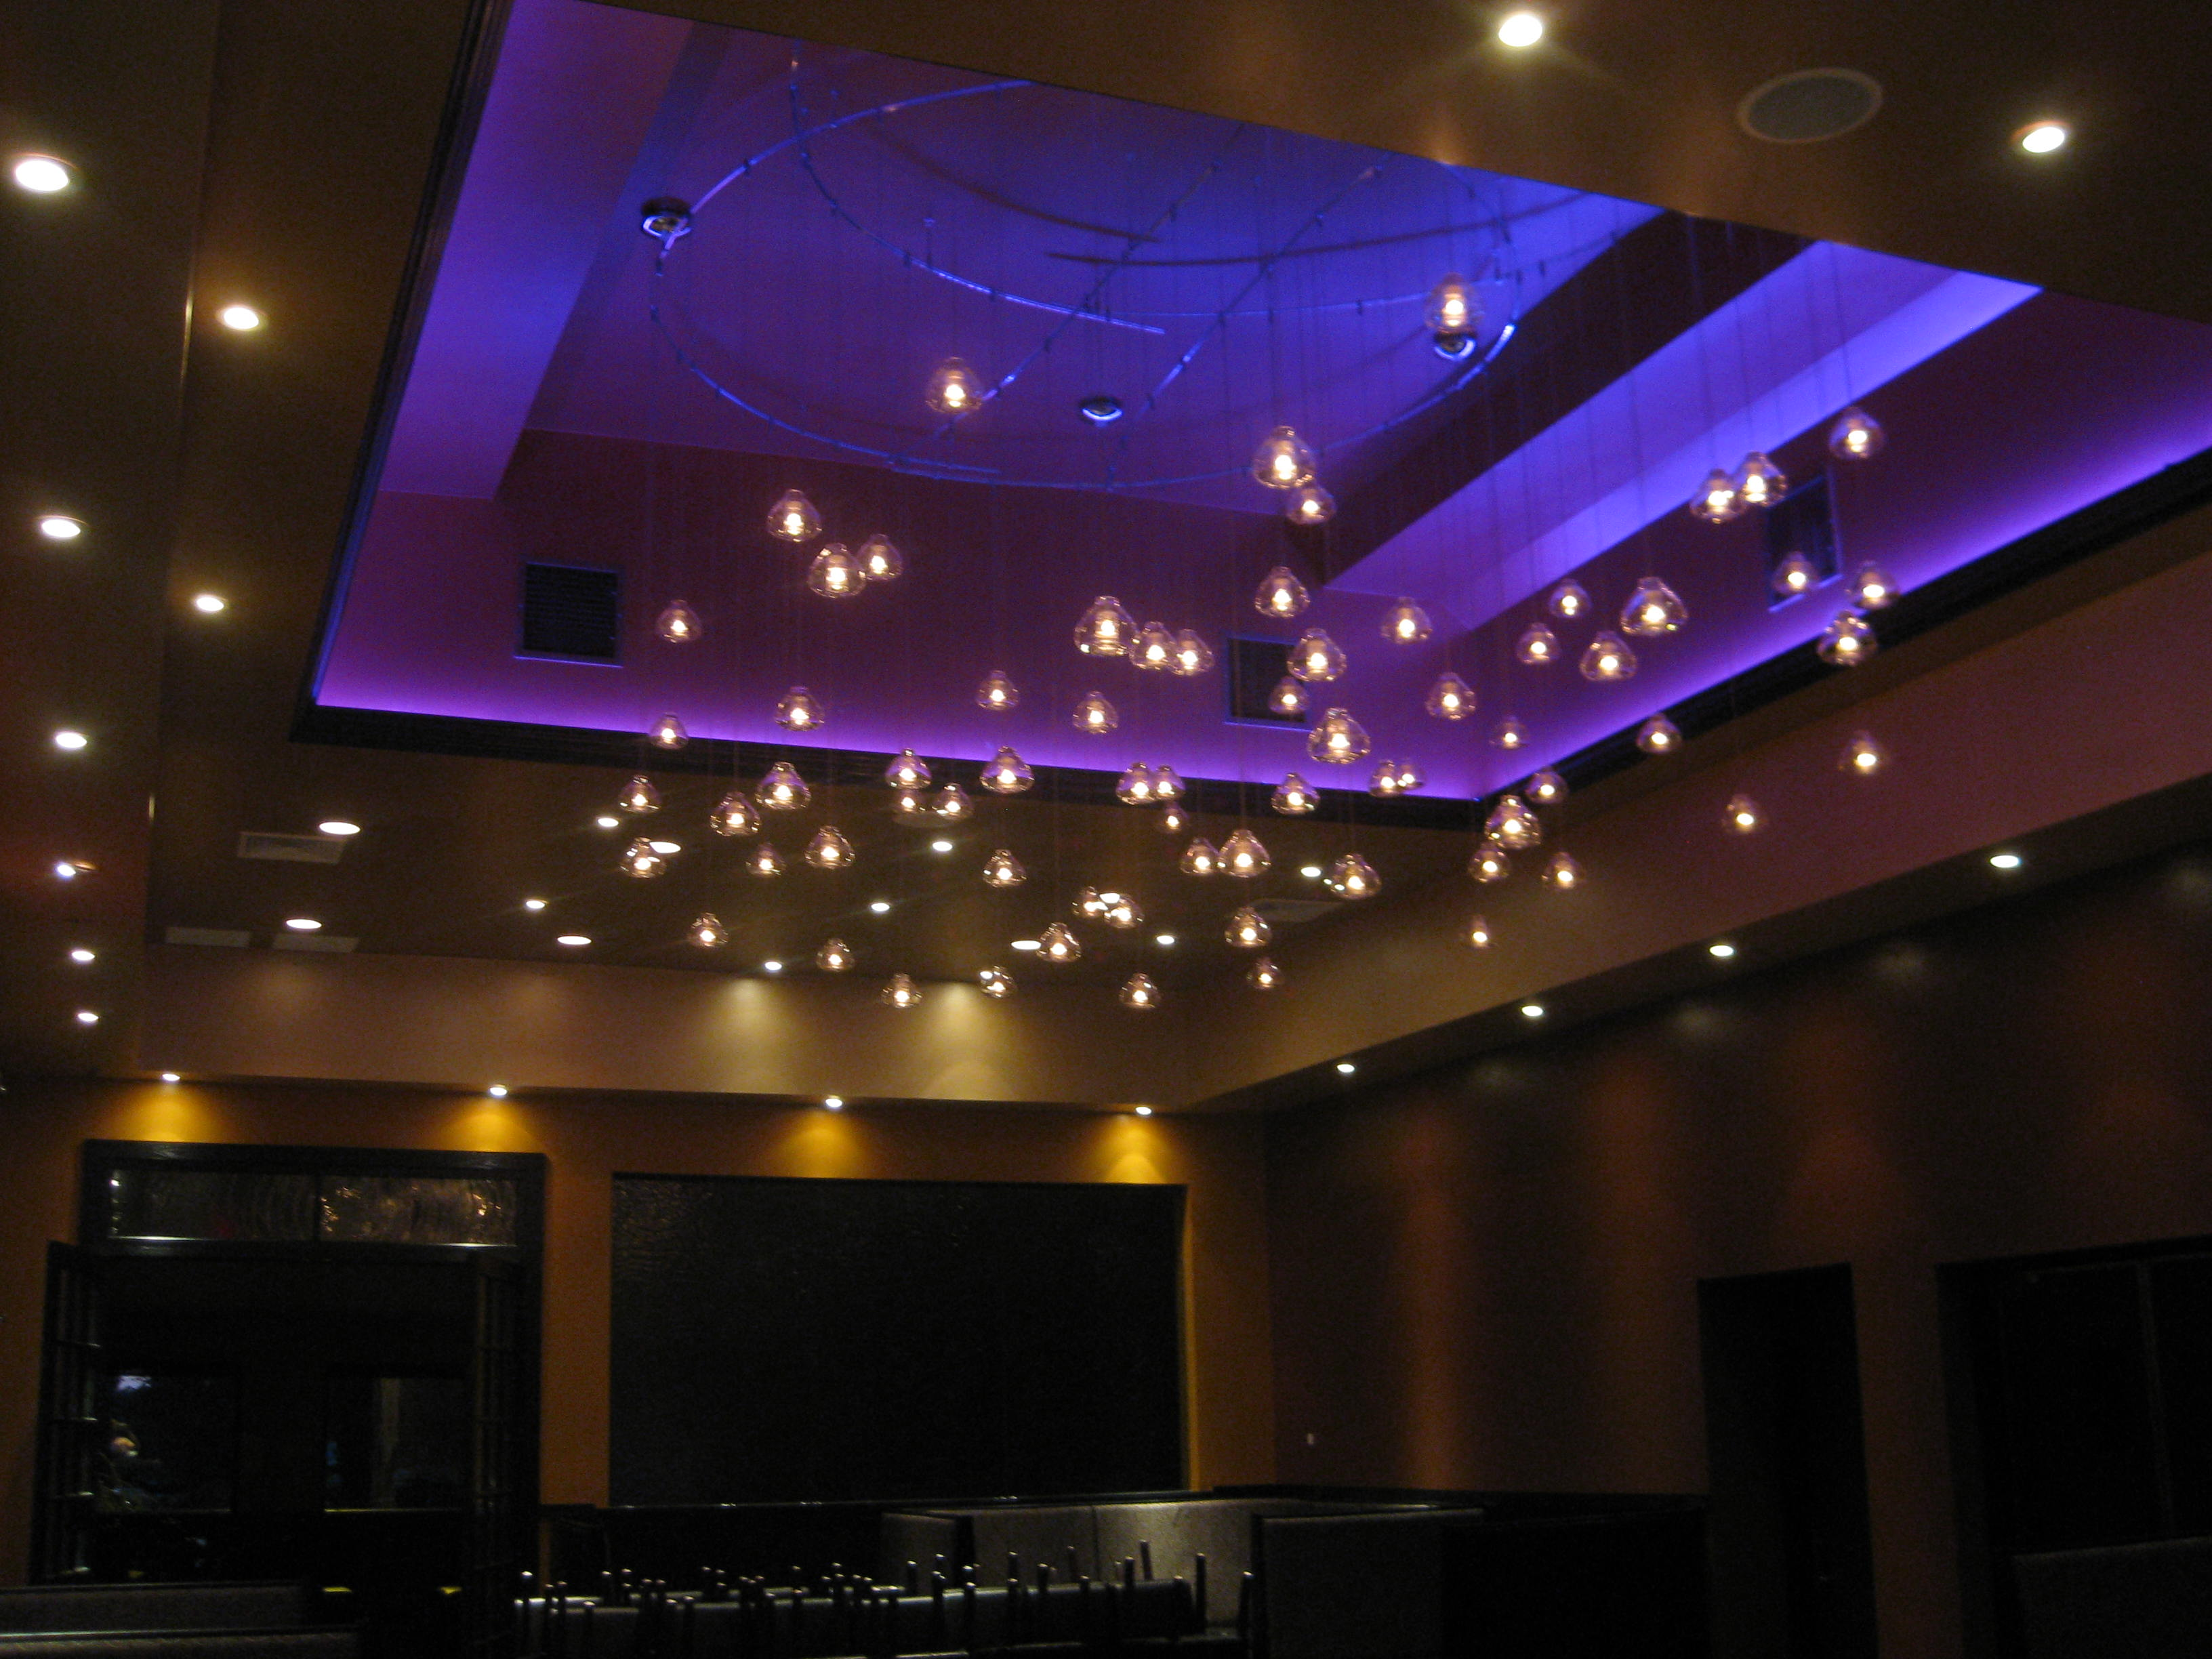 Led Lights In Ceiling: star led lights ceiling photo - 1,Lighting